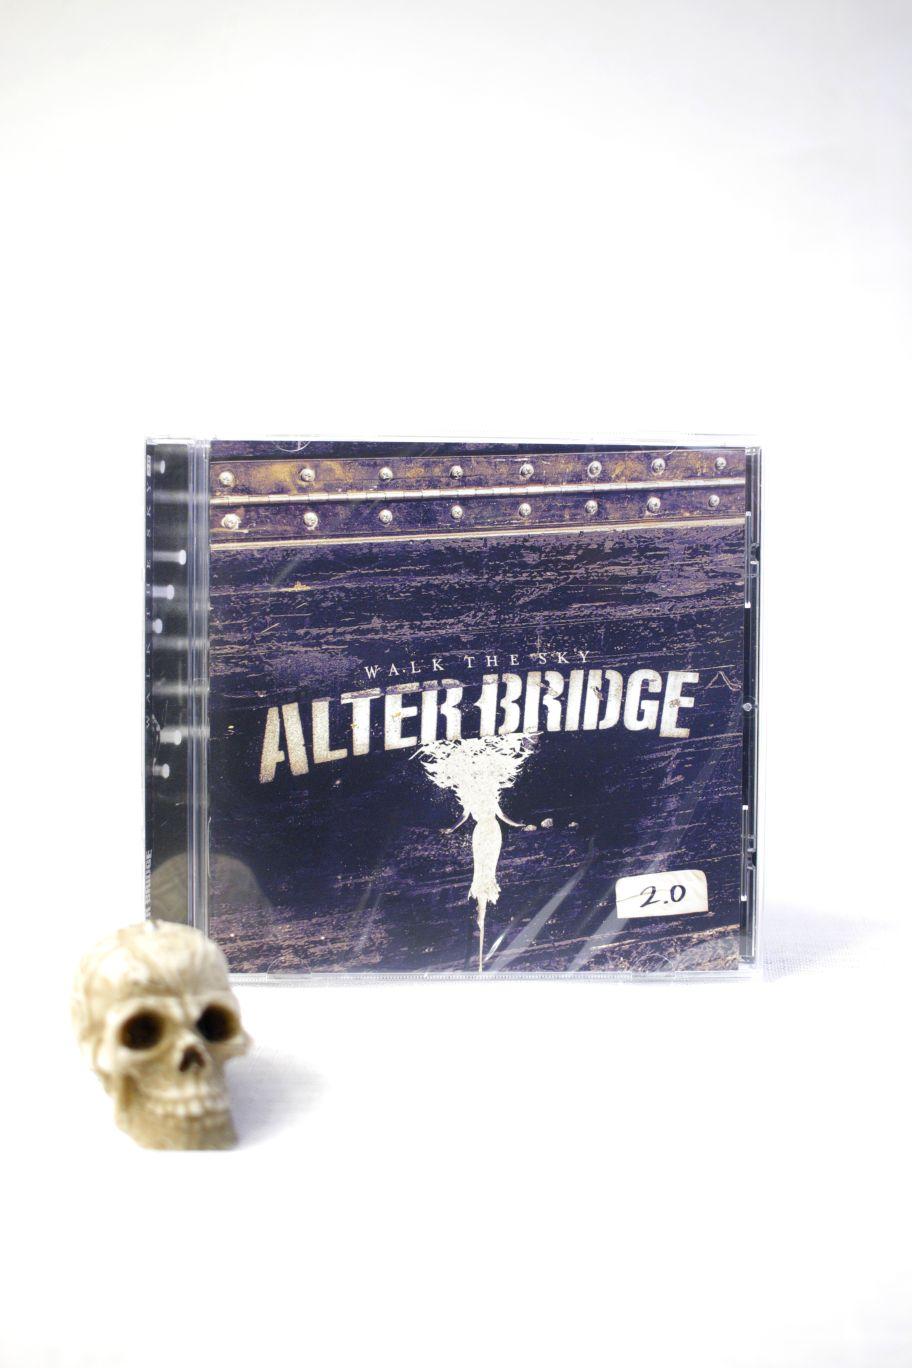 CD ALTER BRIDGE WALK THE SKY 2.0